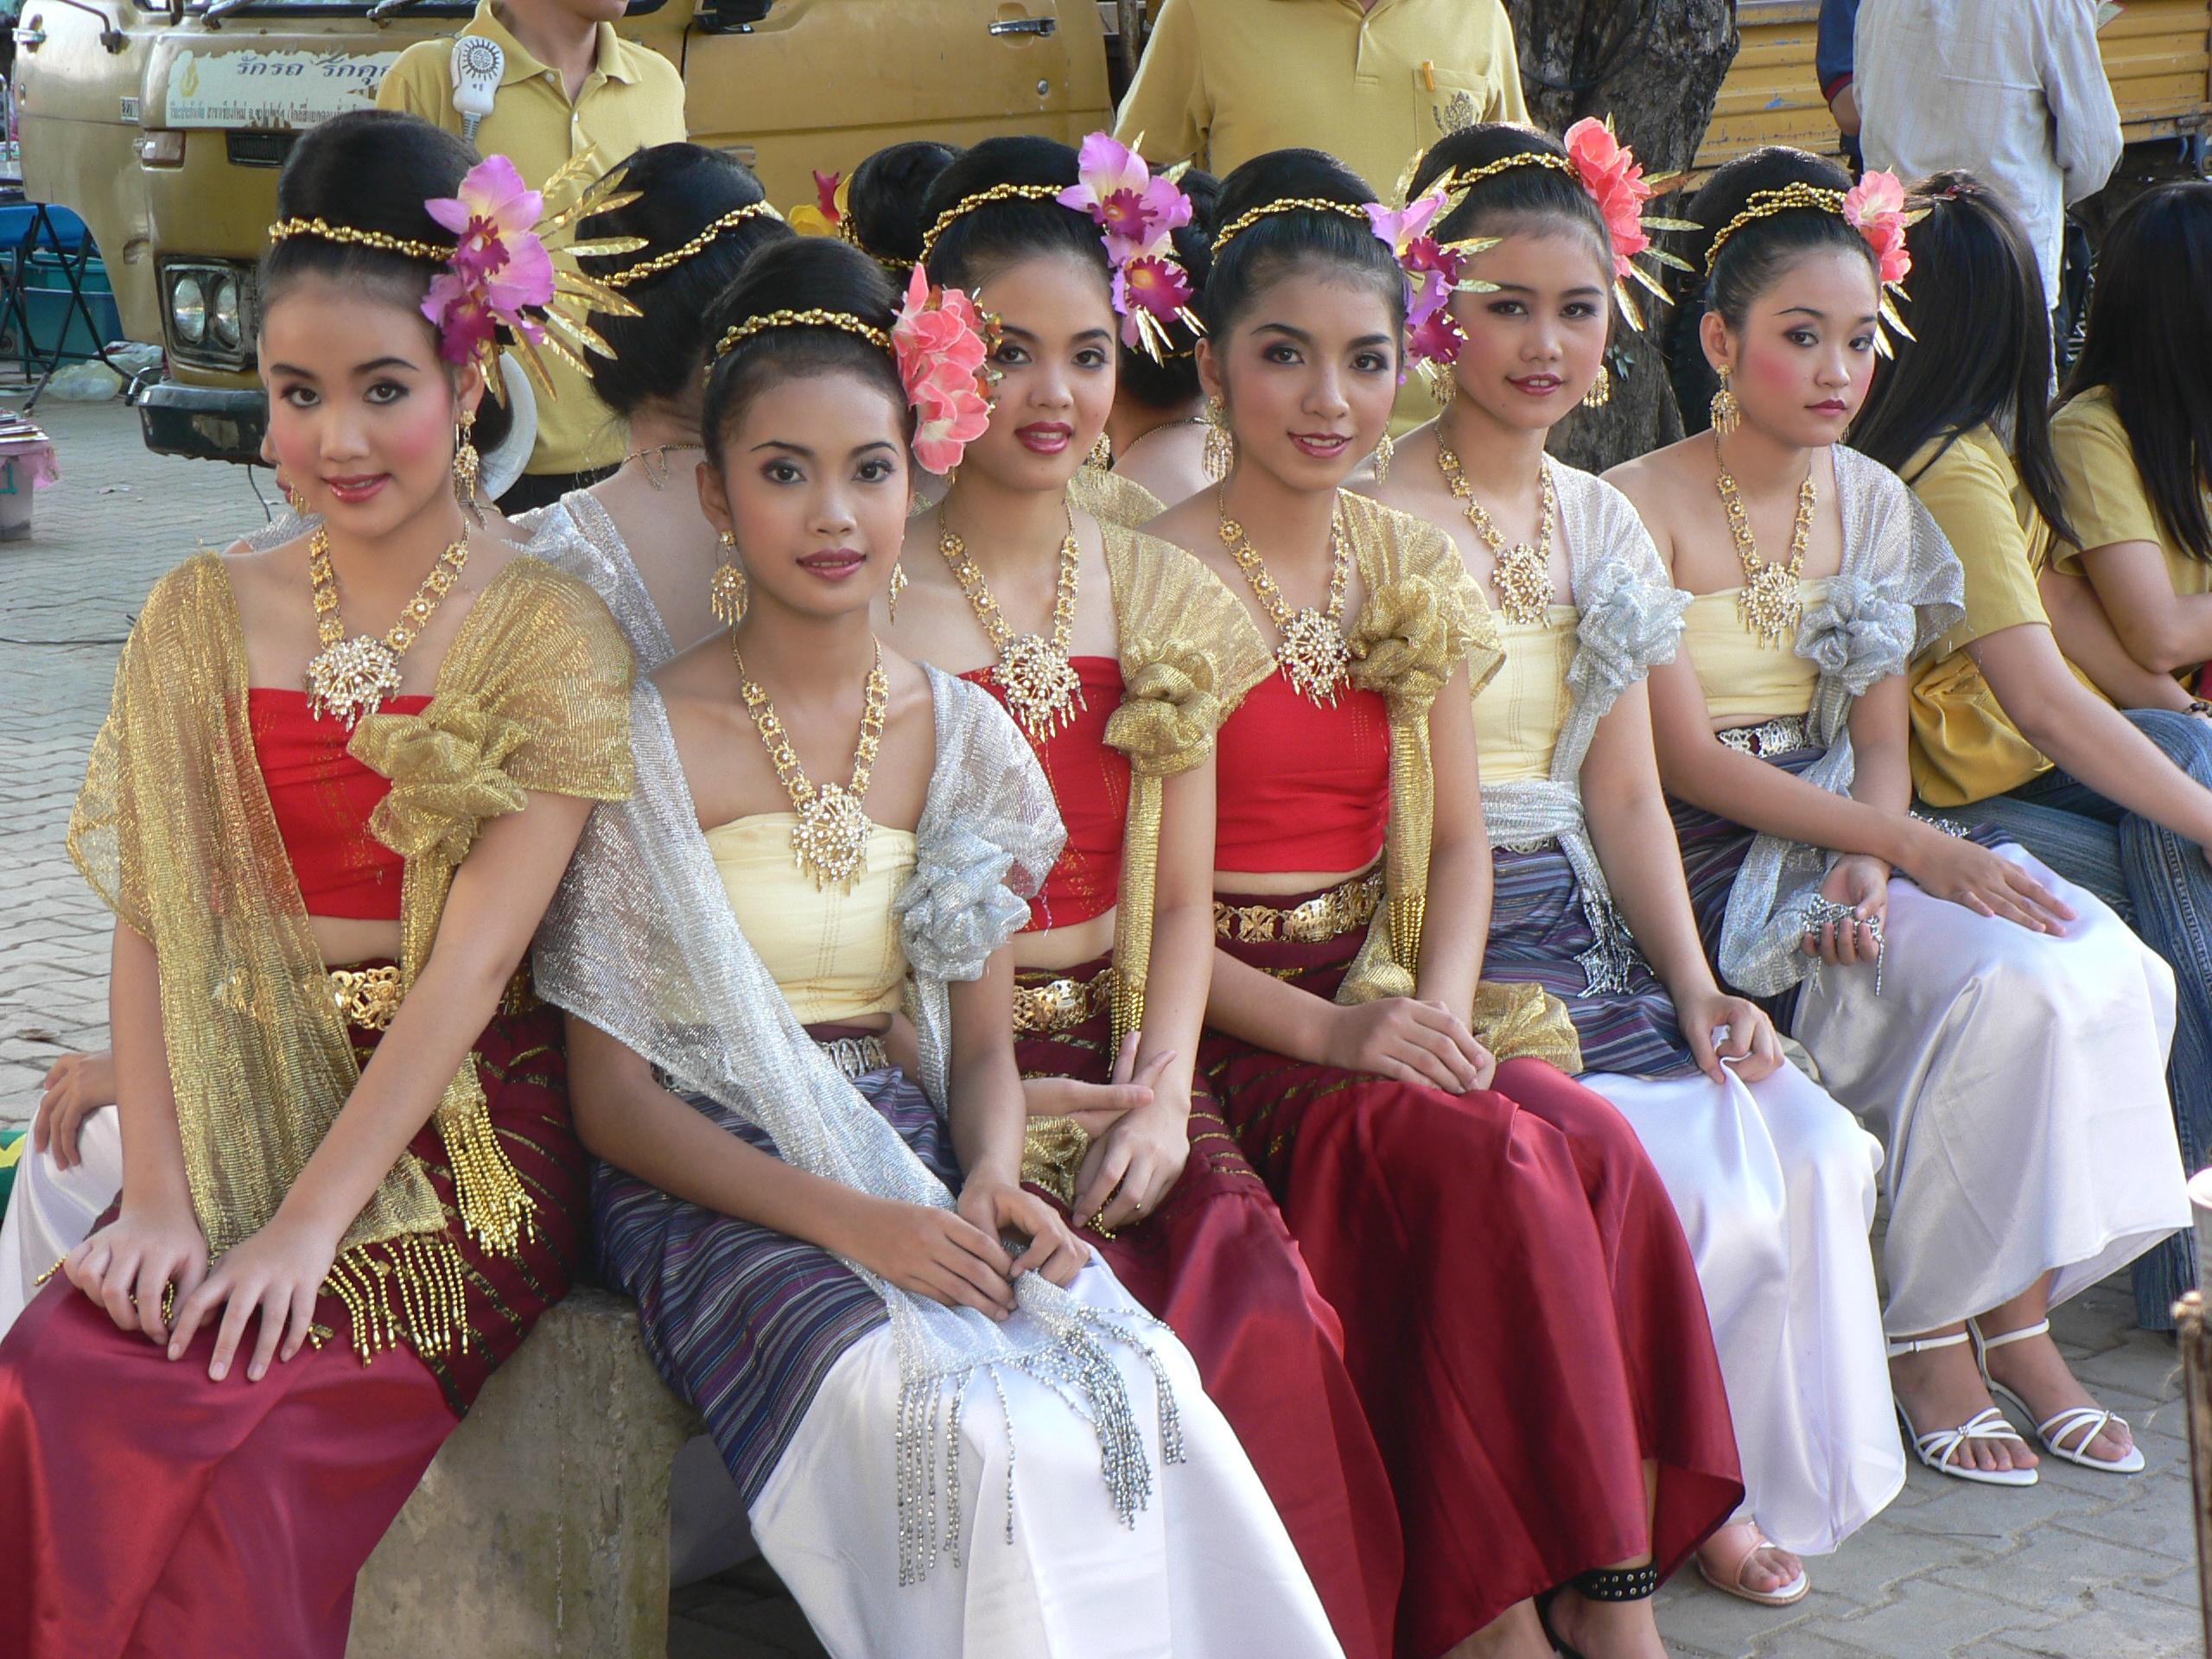 Traditional graphic transparent 17 Best images about Thai Traditional on Pinterest | Traditional ... graphic transparent